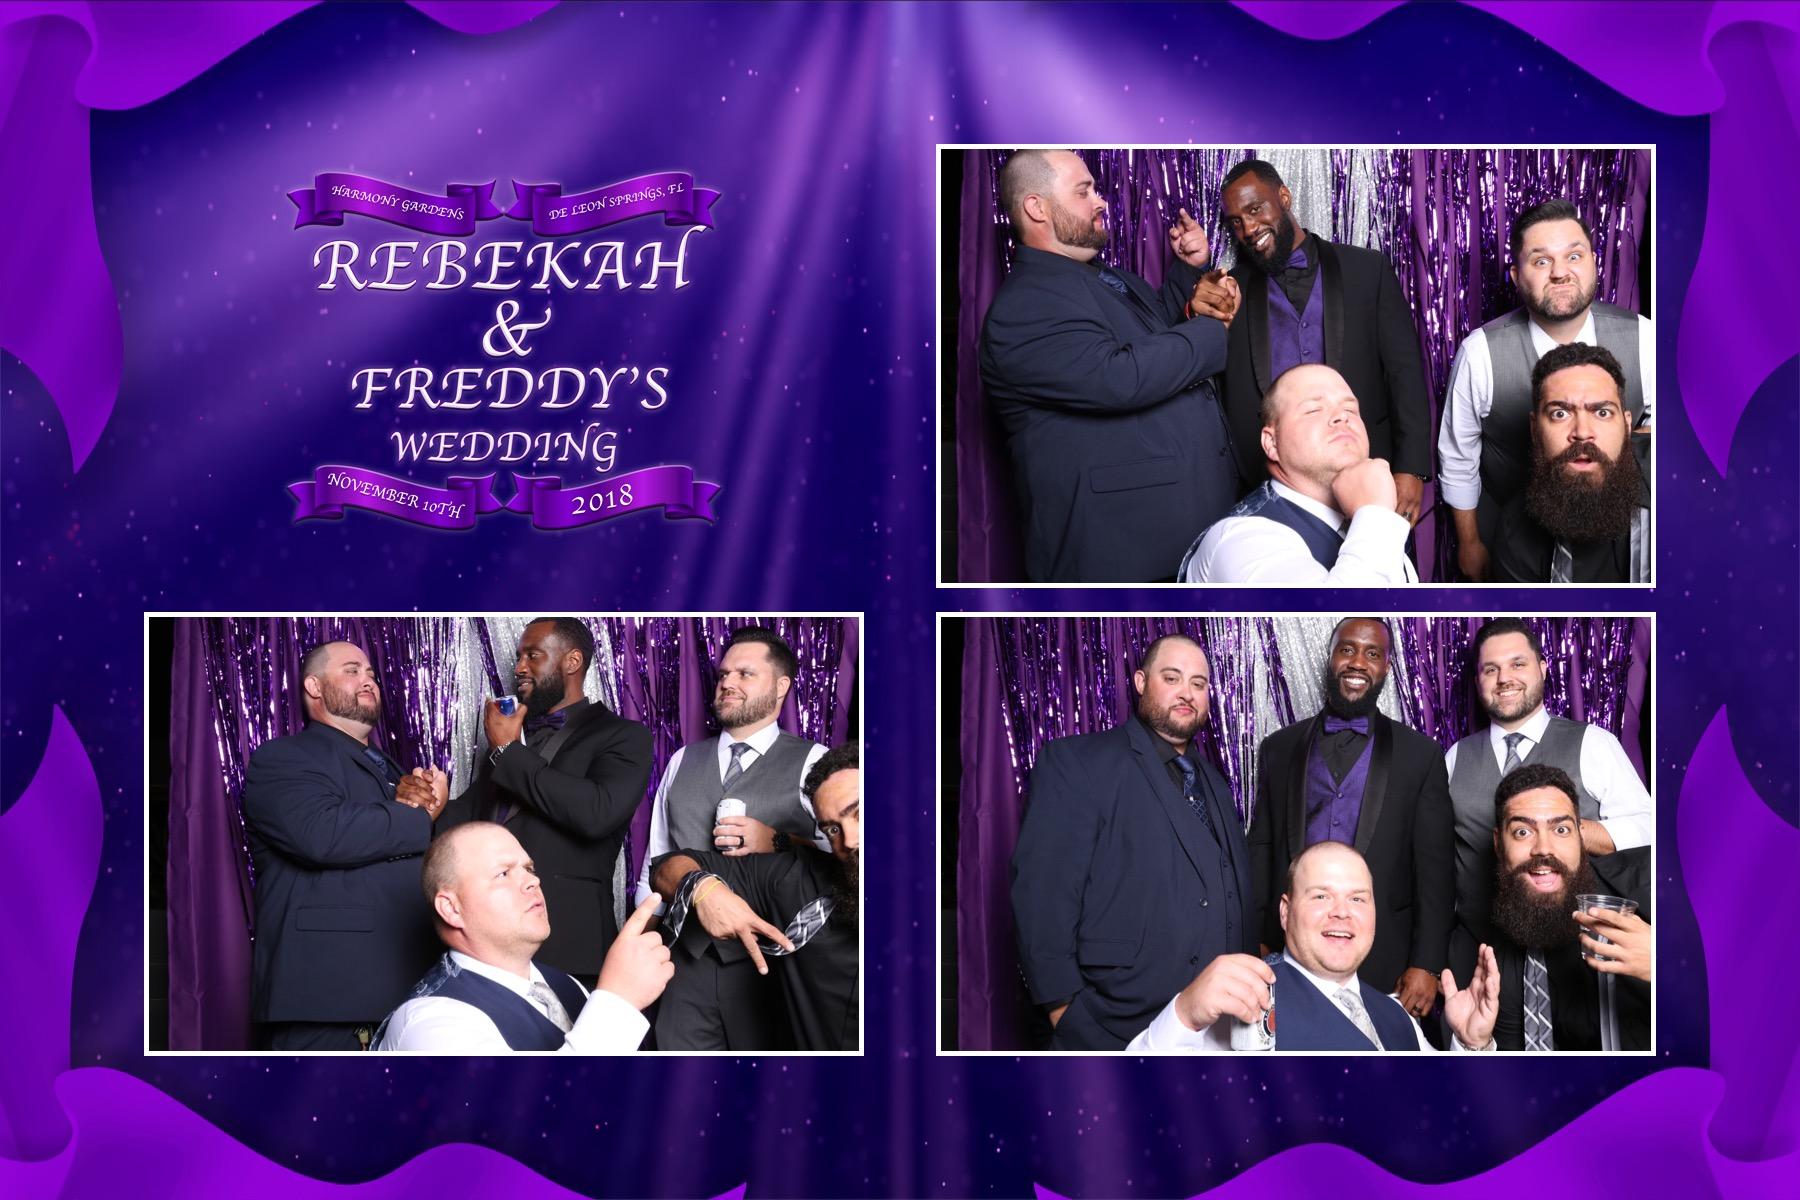 Booth Chamber Photo Booth Harmony Gardens wedding antoine Hart de leon springs_4.jpeg